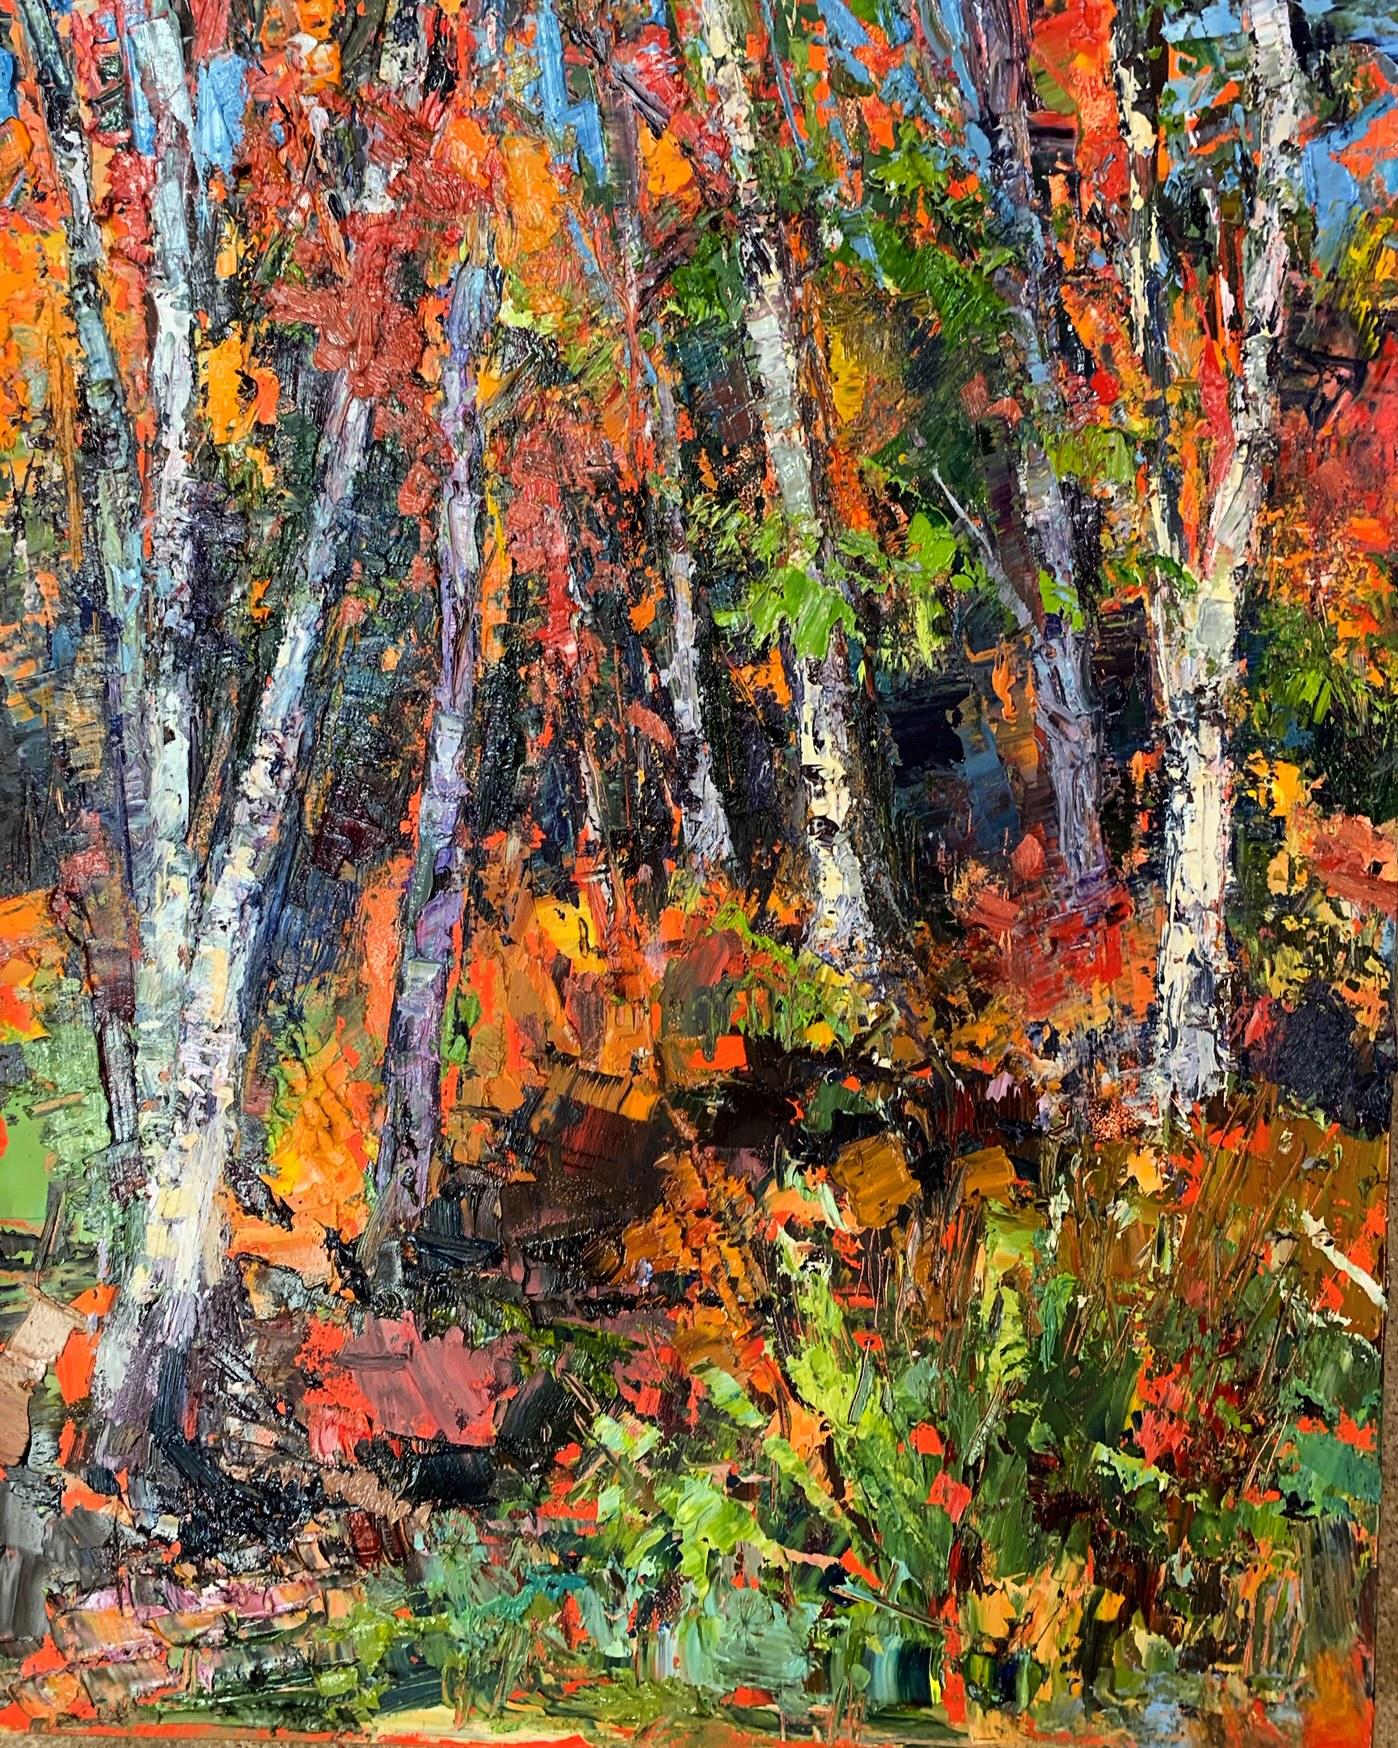 Birches & Foliage